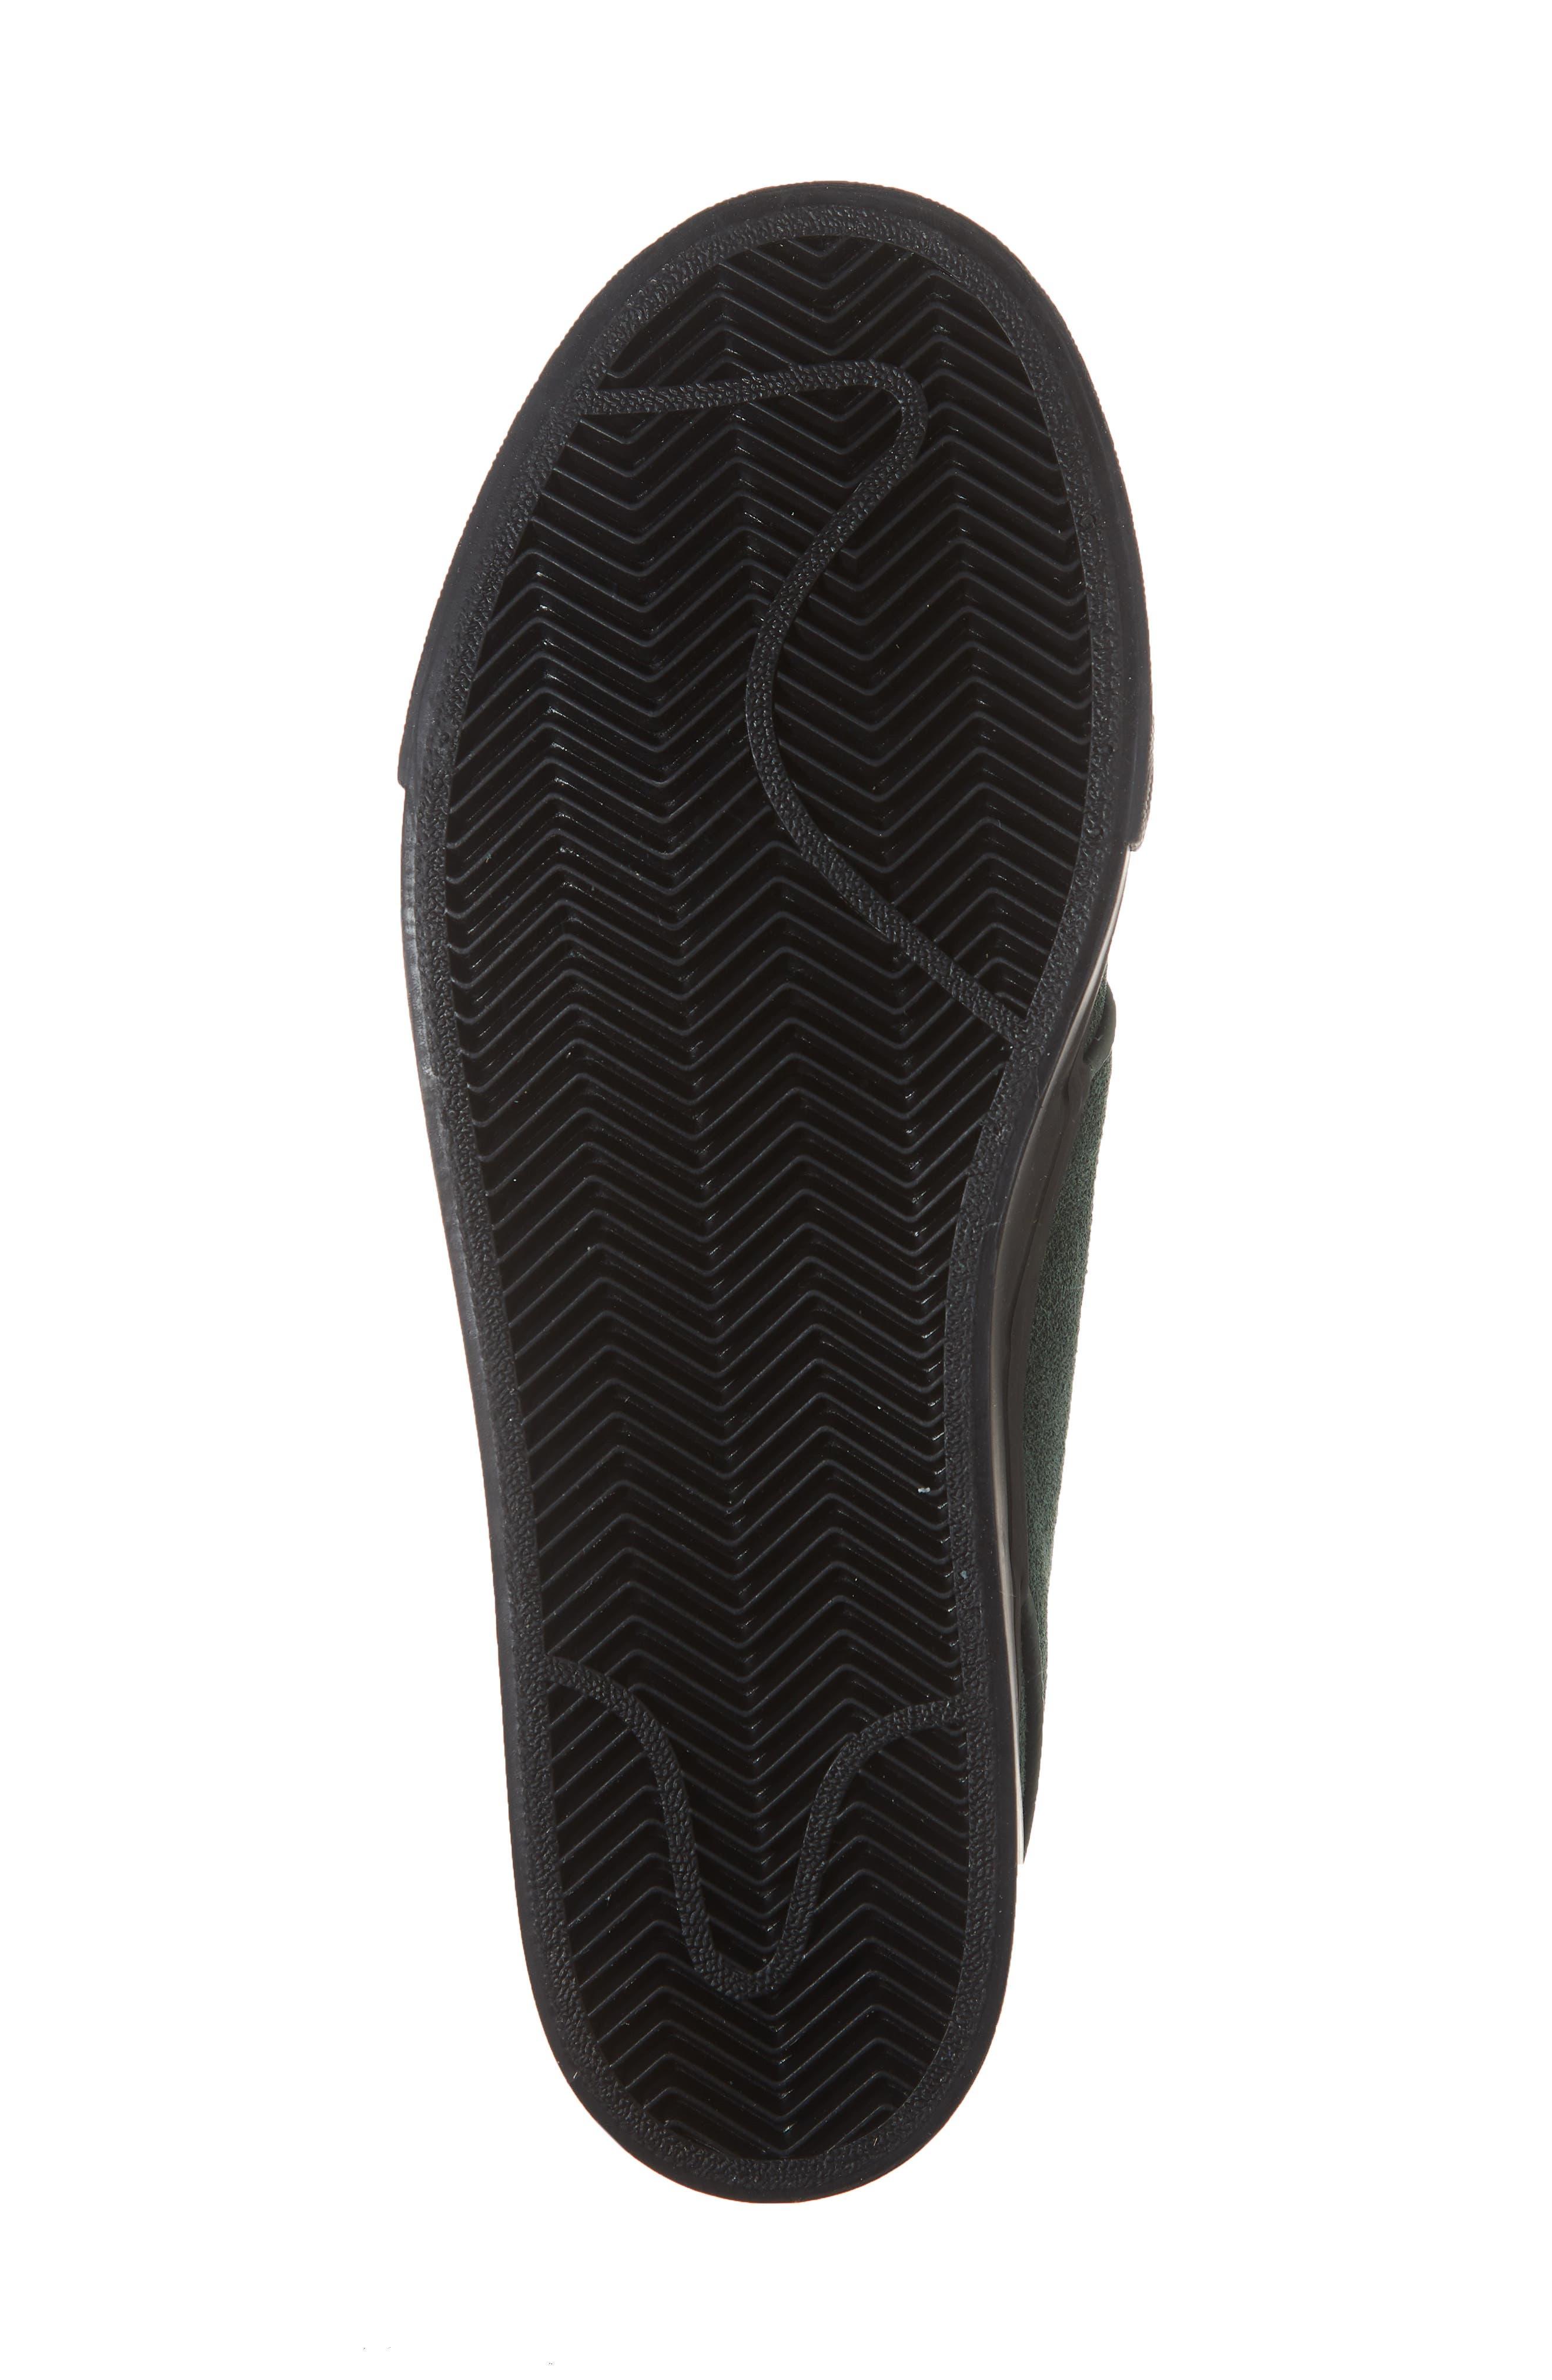 'Zoom - Stefan Janoski' Skate Shoe,                             Alternate thumbnail 4, color,                             Midnight Green/ Black